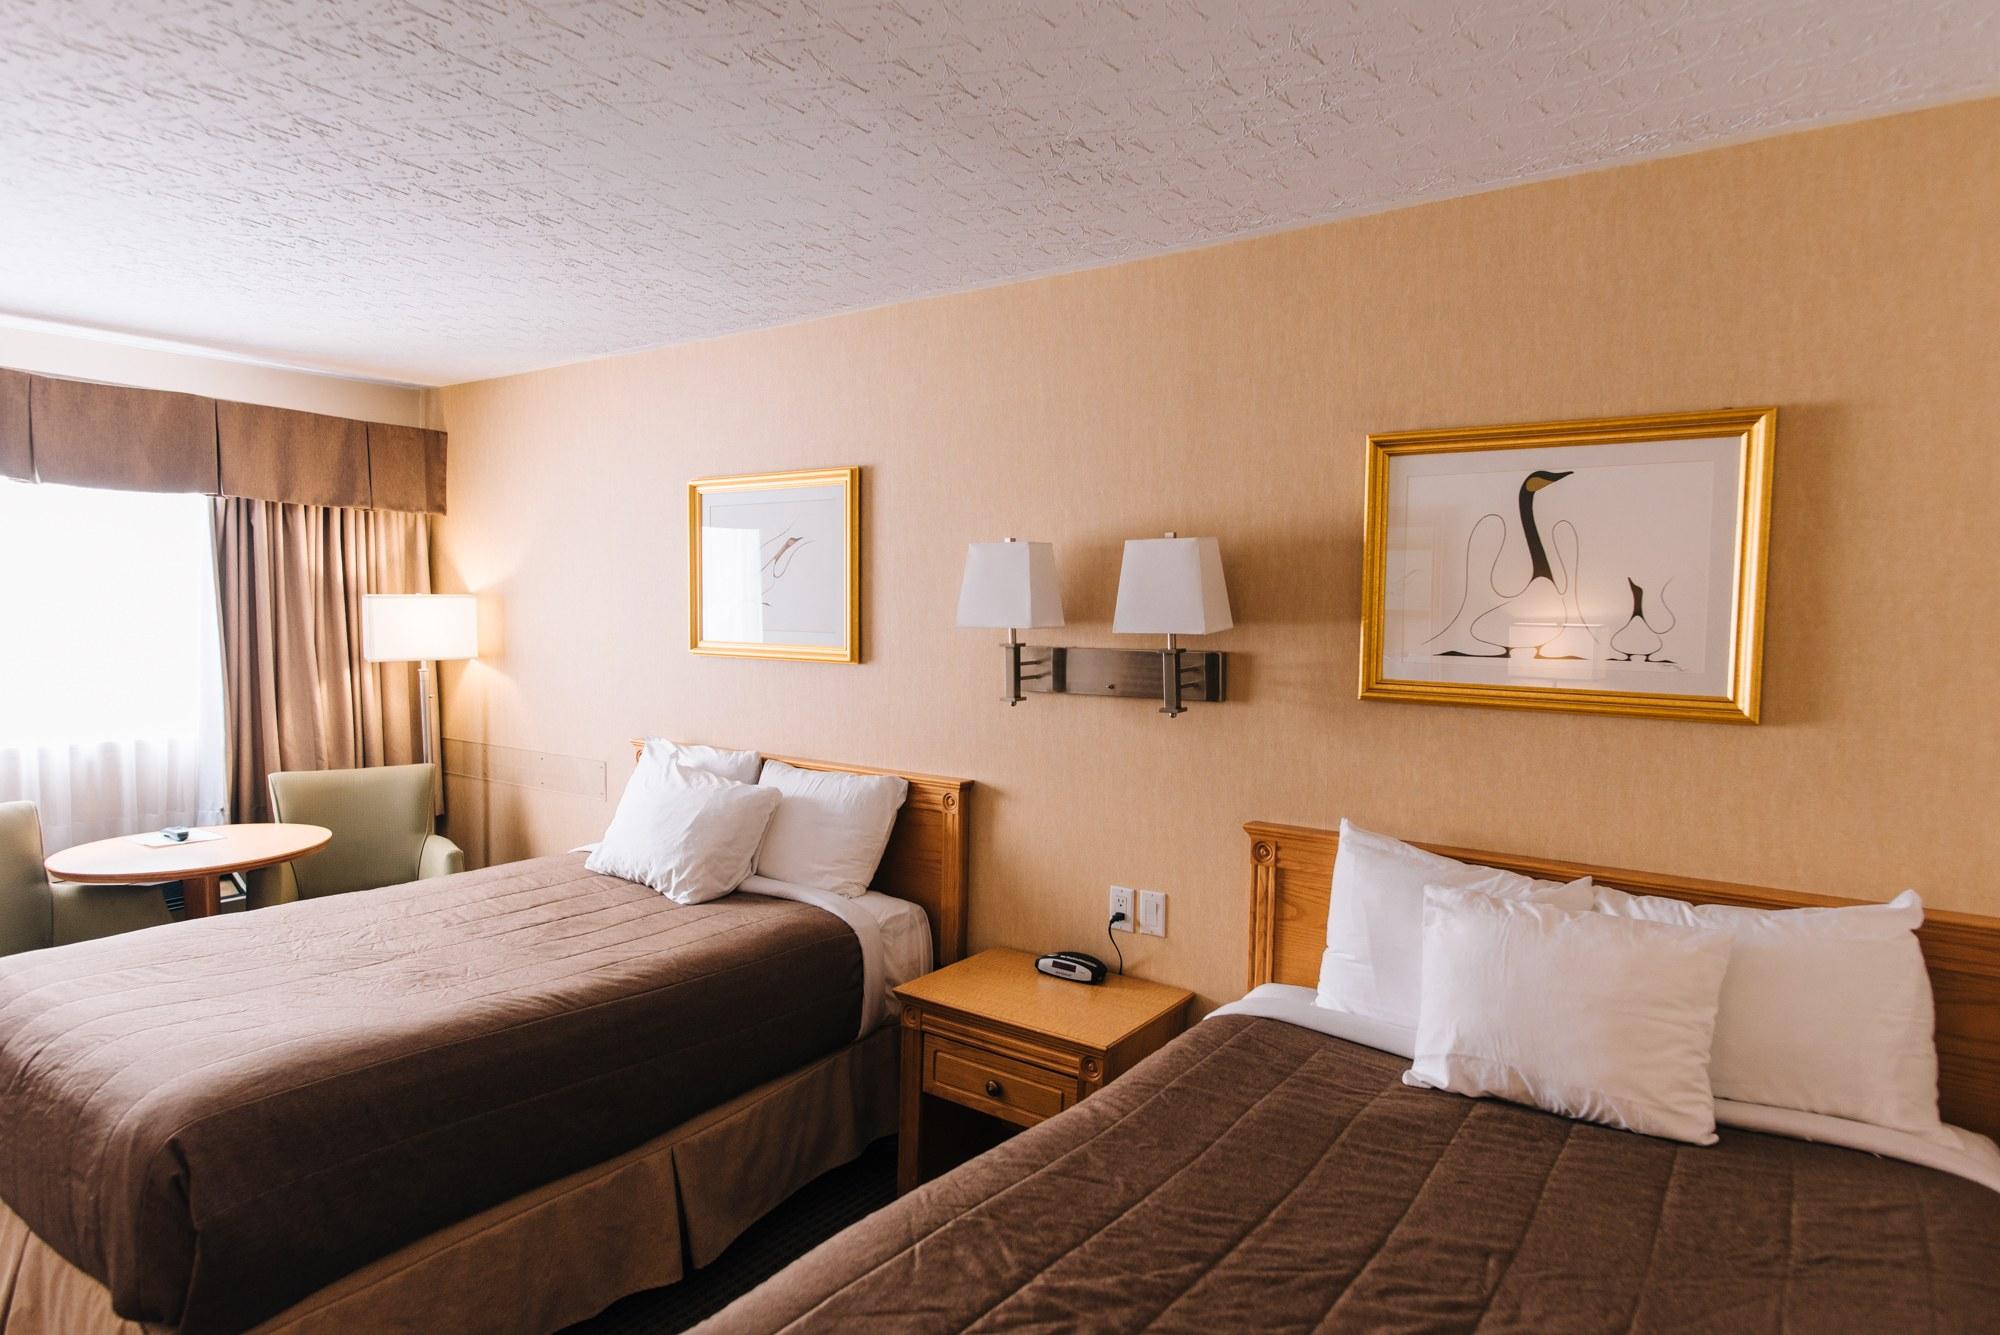 Hotel-centre-ville-rouyn-noranda-standard-3